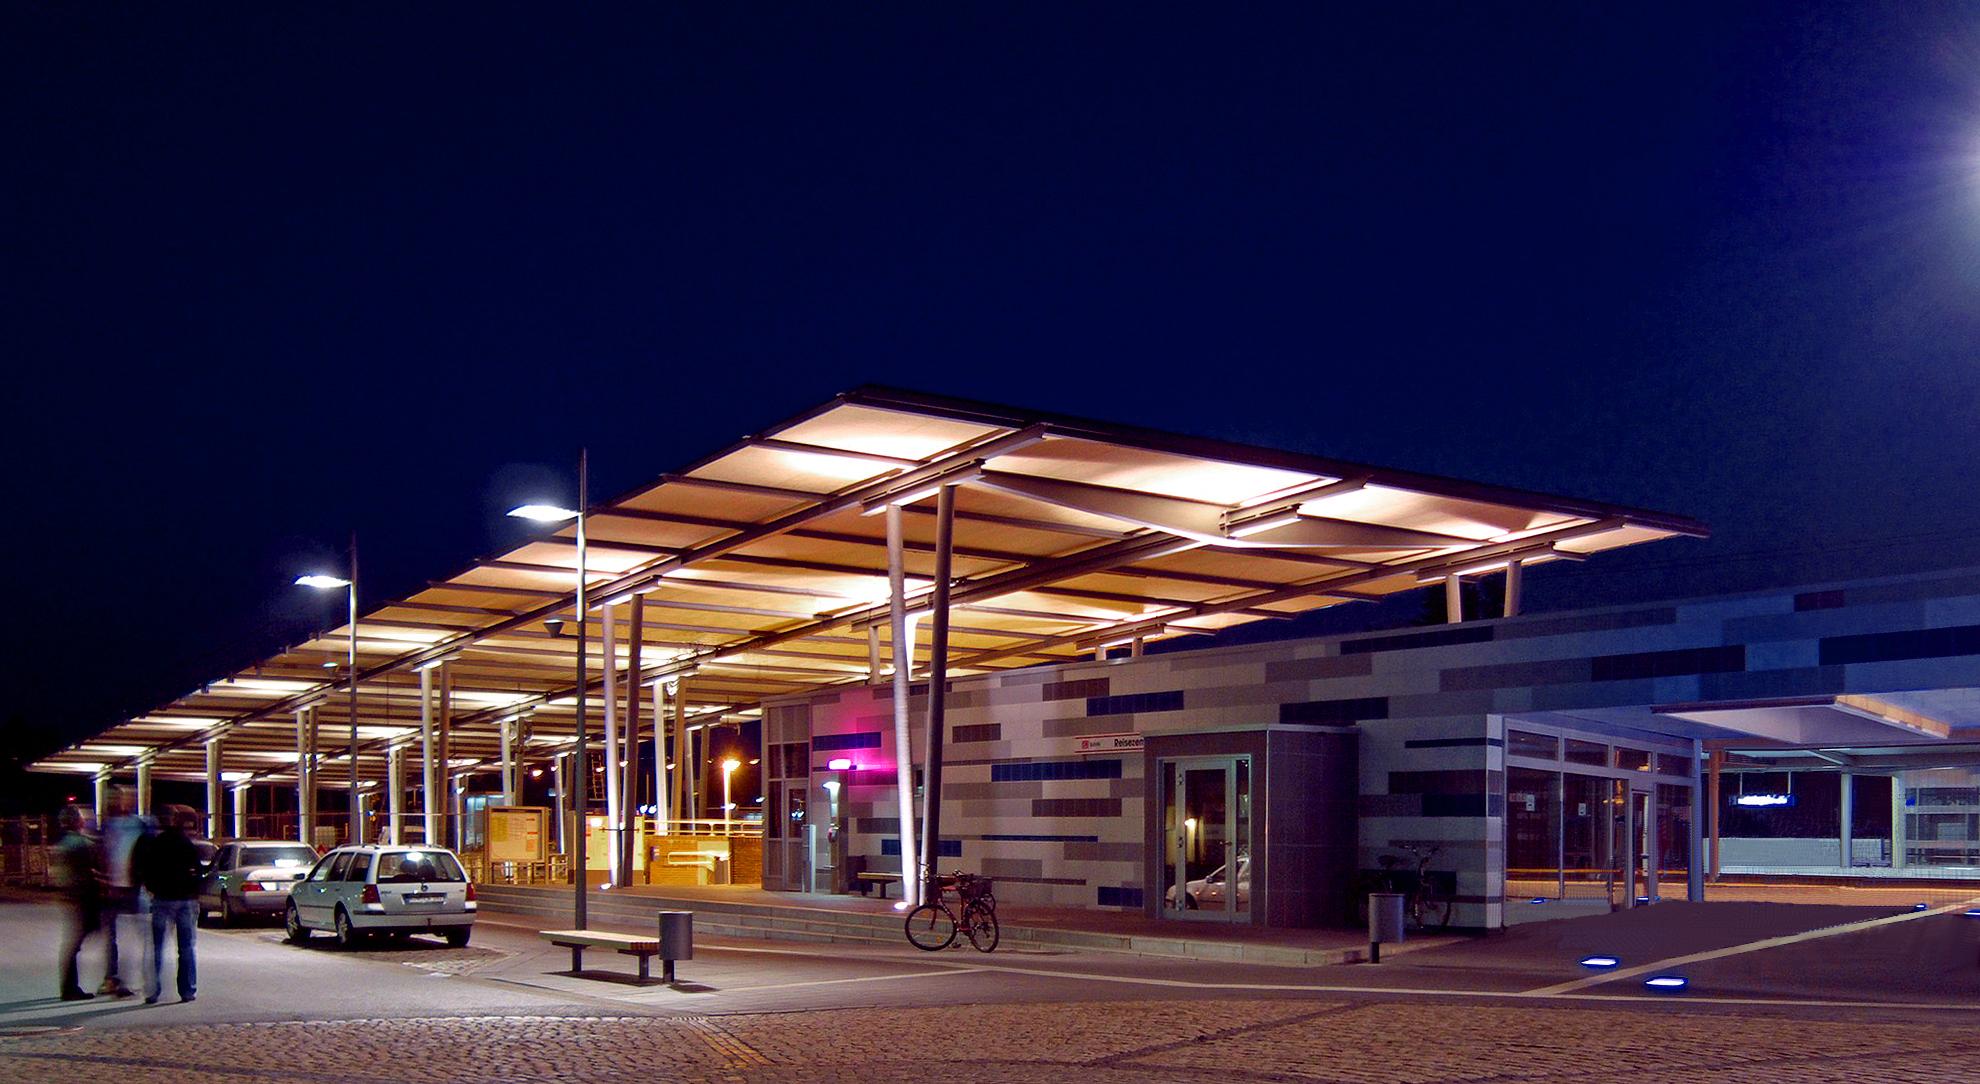 ROW_Bahnhof_15_04_09_Kreiszeitung_02b